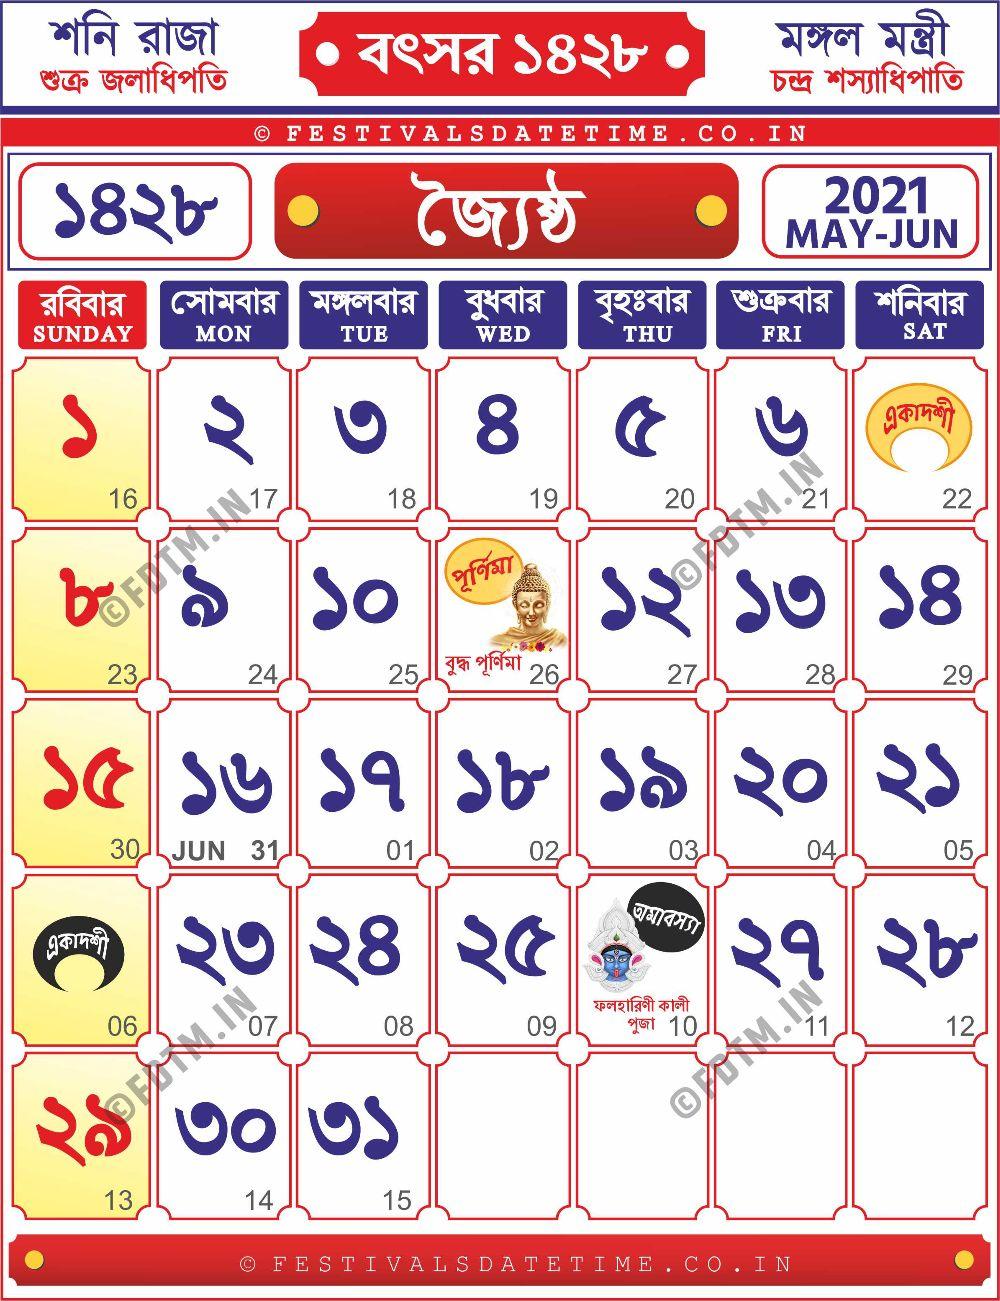 1428 Bengali Calendar - 1428 Jaistho Month Calendar - 1428 Jaistho Bangla Calendar